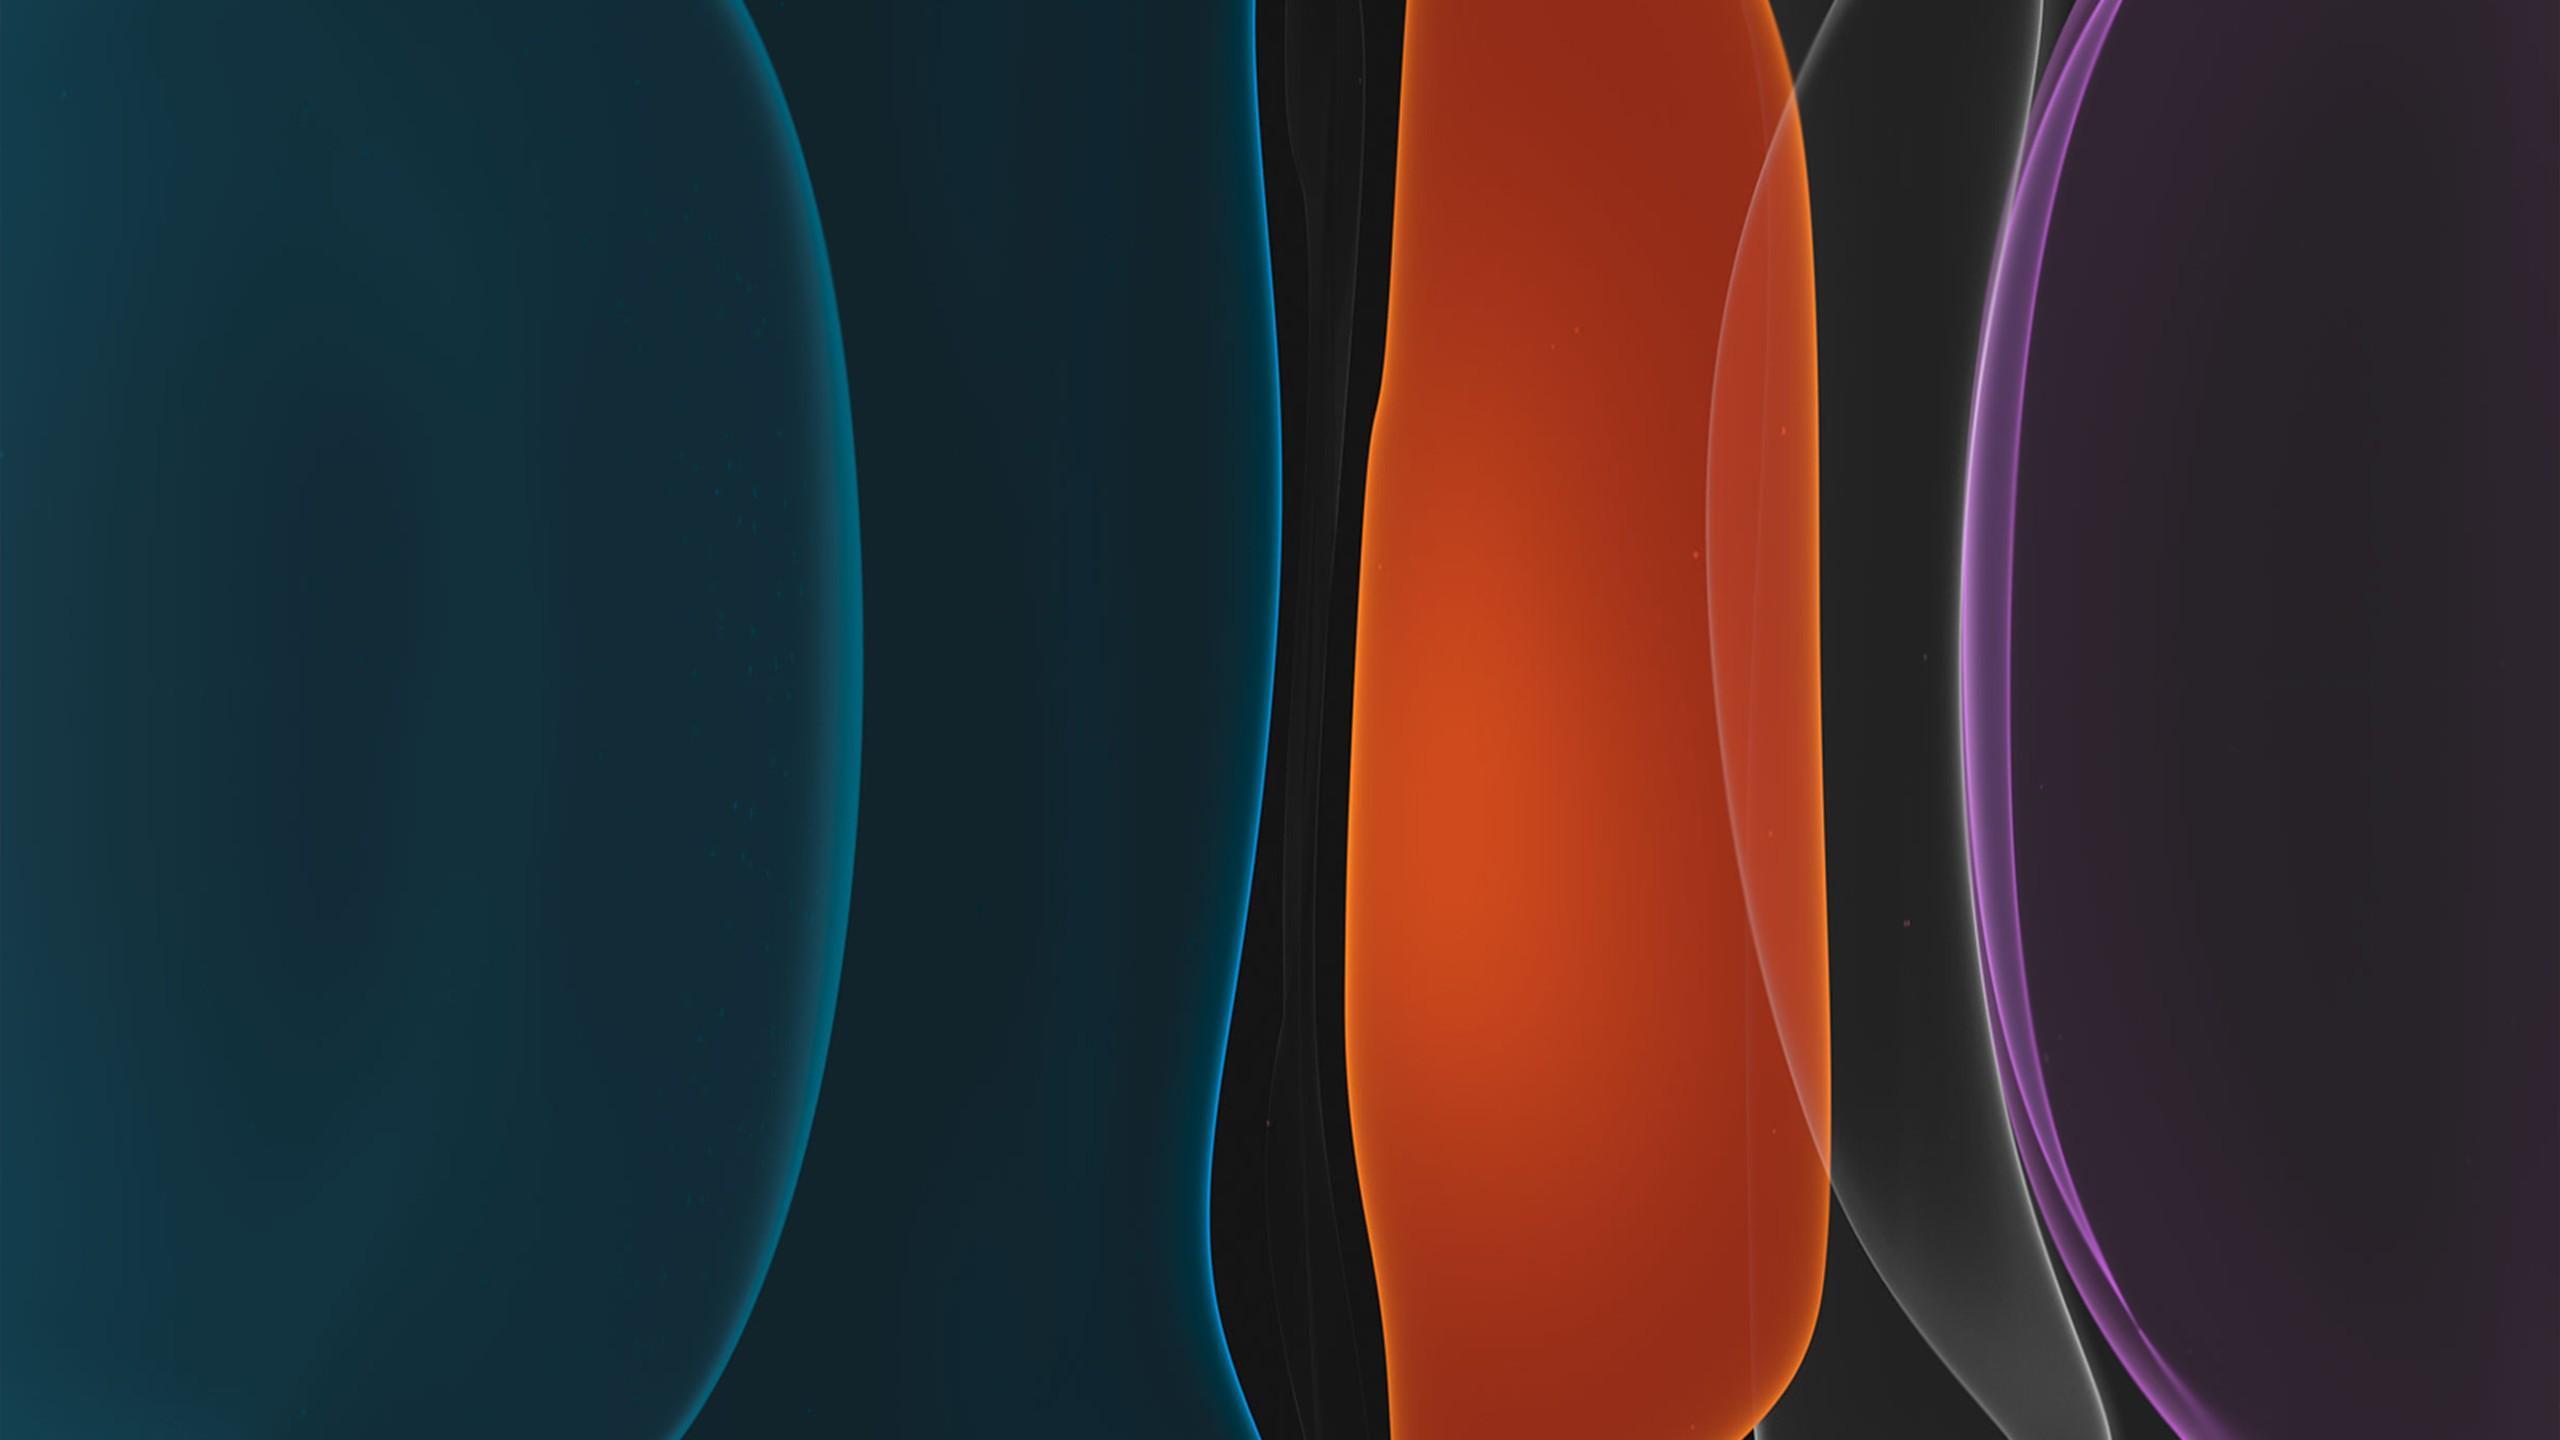 Iphone 11 - HD Wallpaper